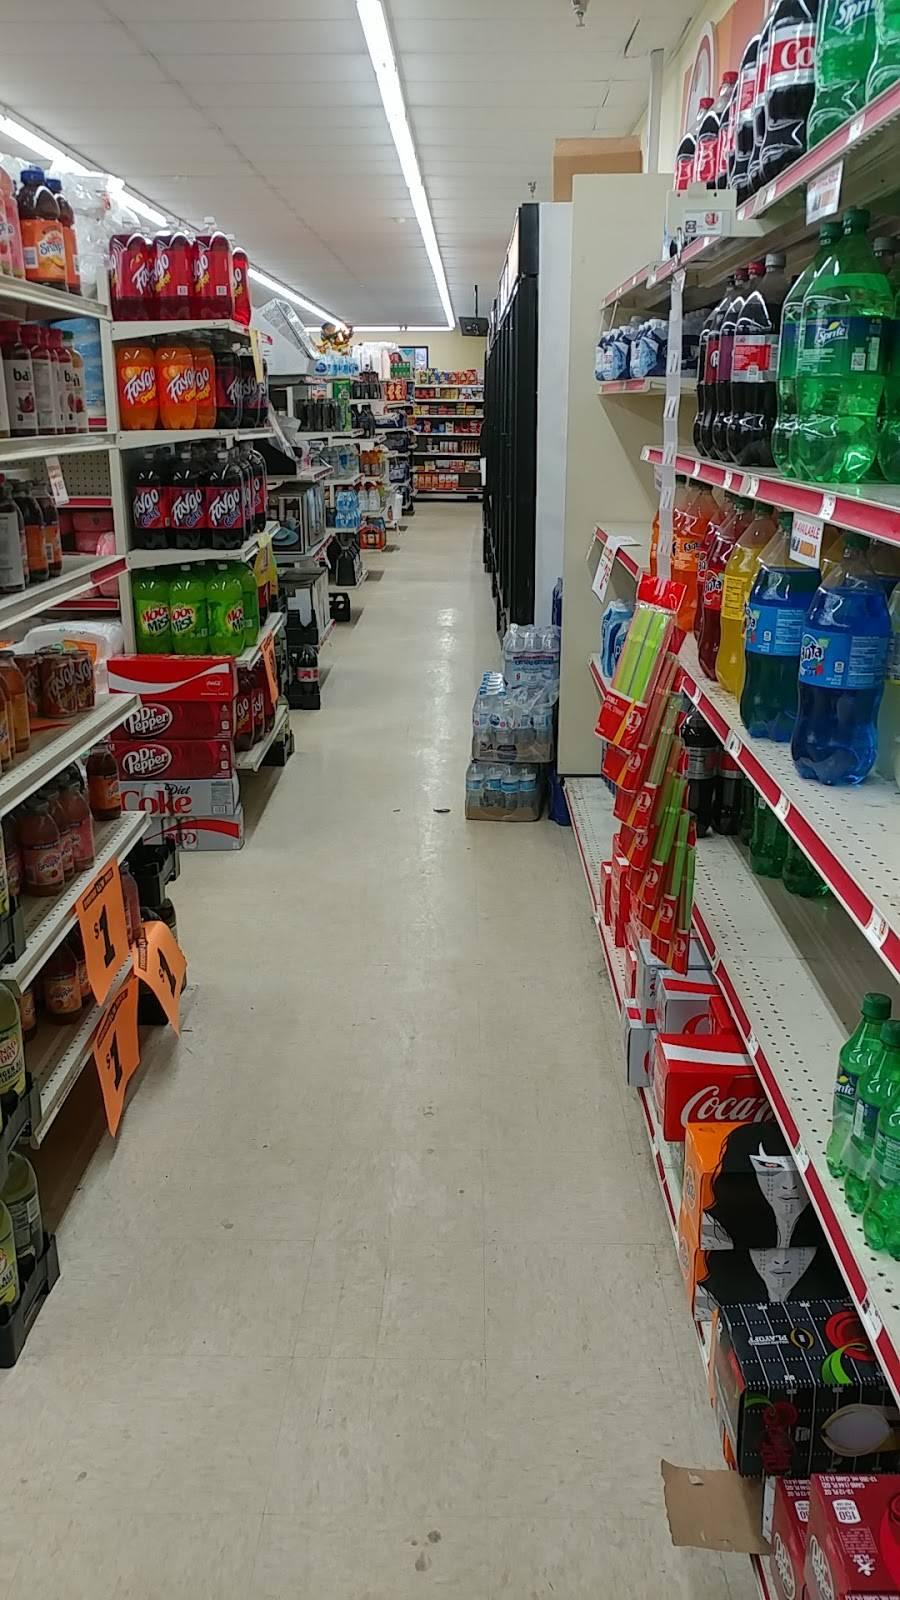 Family Dollar - supermarket  | Photo 2 of 3 | Address: 25190 Van Born Rd, Dearborn Heights, MI 48125, USA | Phone: (313) 203-1257